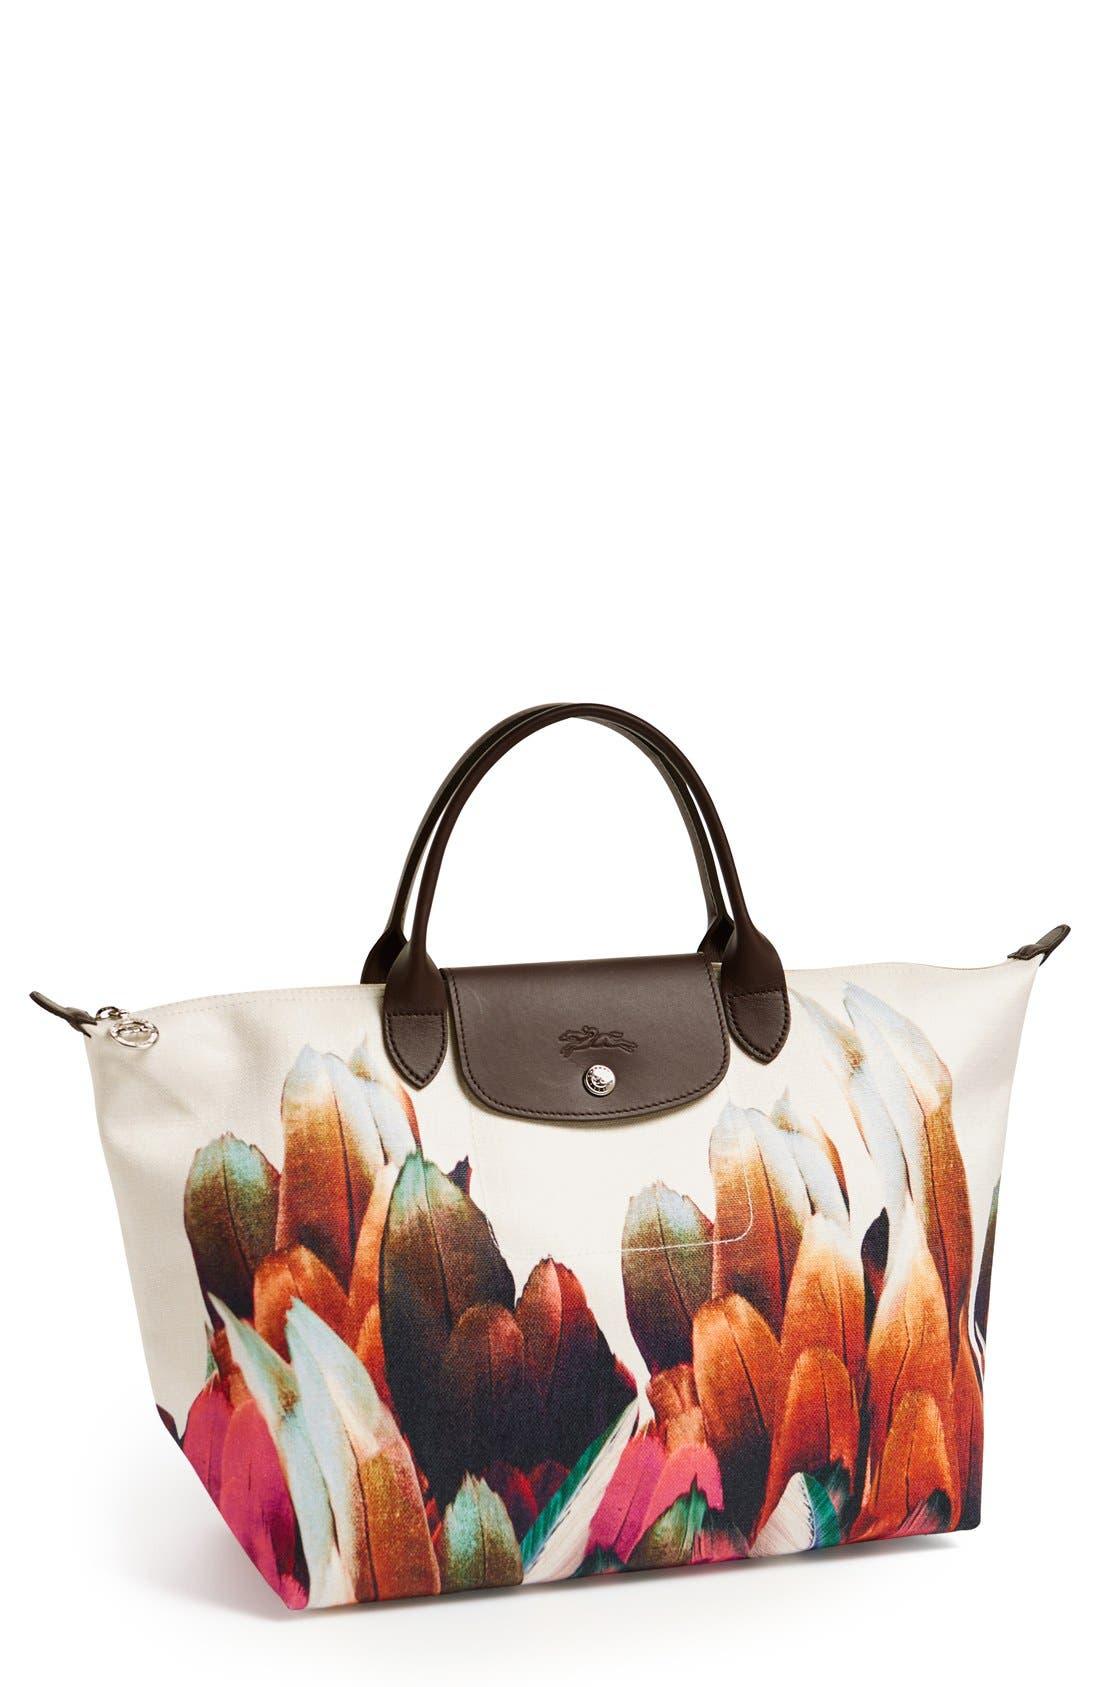 Alternate Image 1 Selected - Longchamp 'Medium Tribu' Handbag